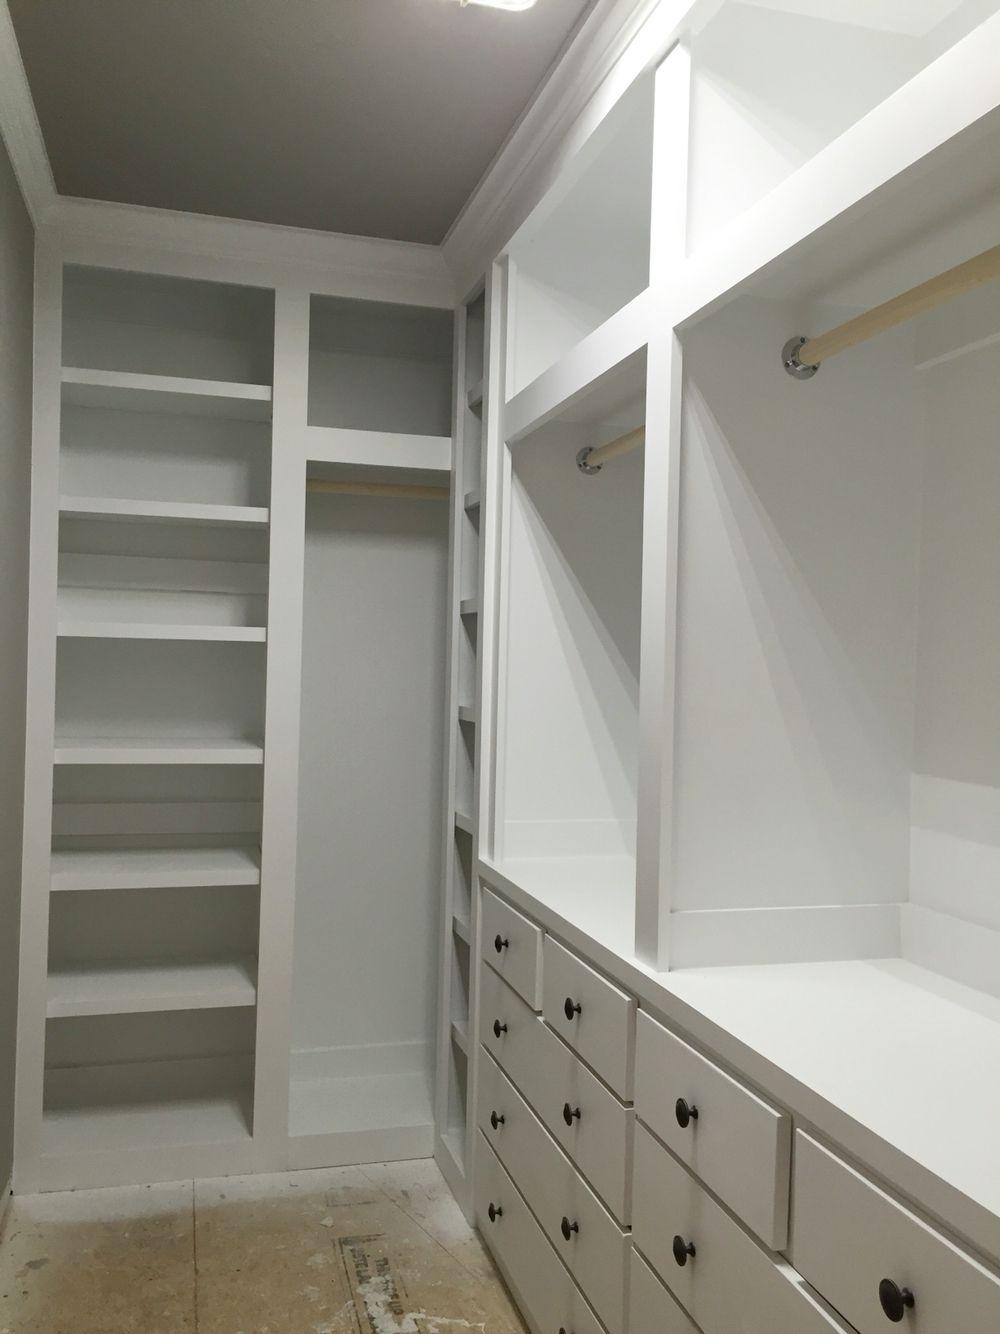 Built in closet in 11 foot by 5 foot room. Closet built